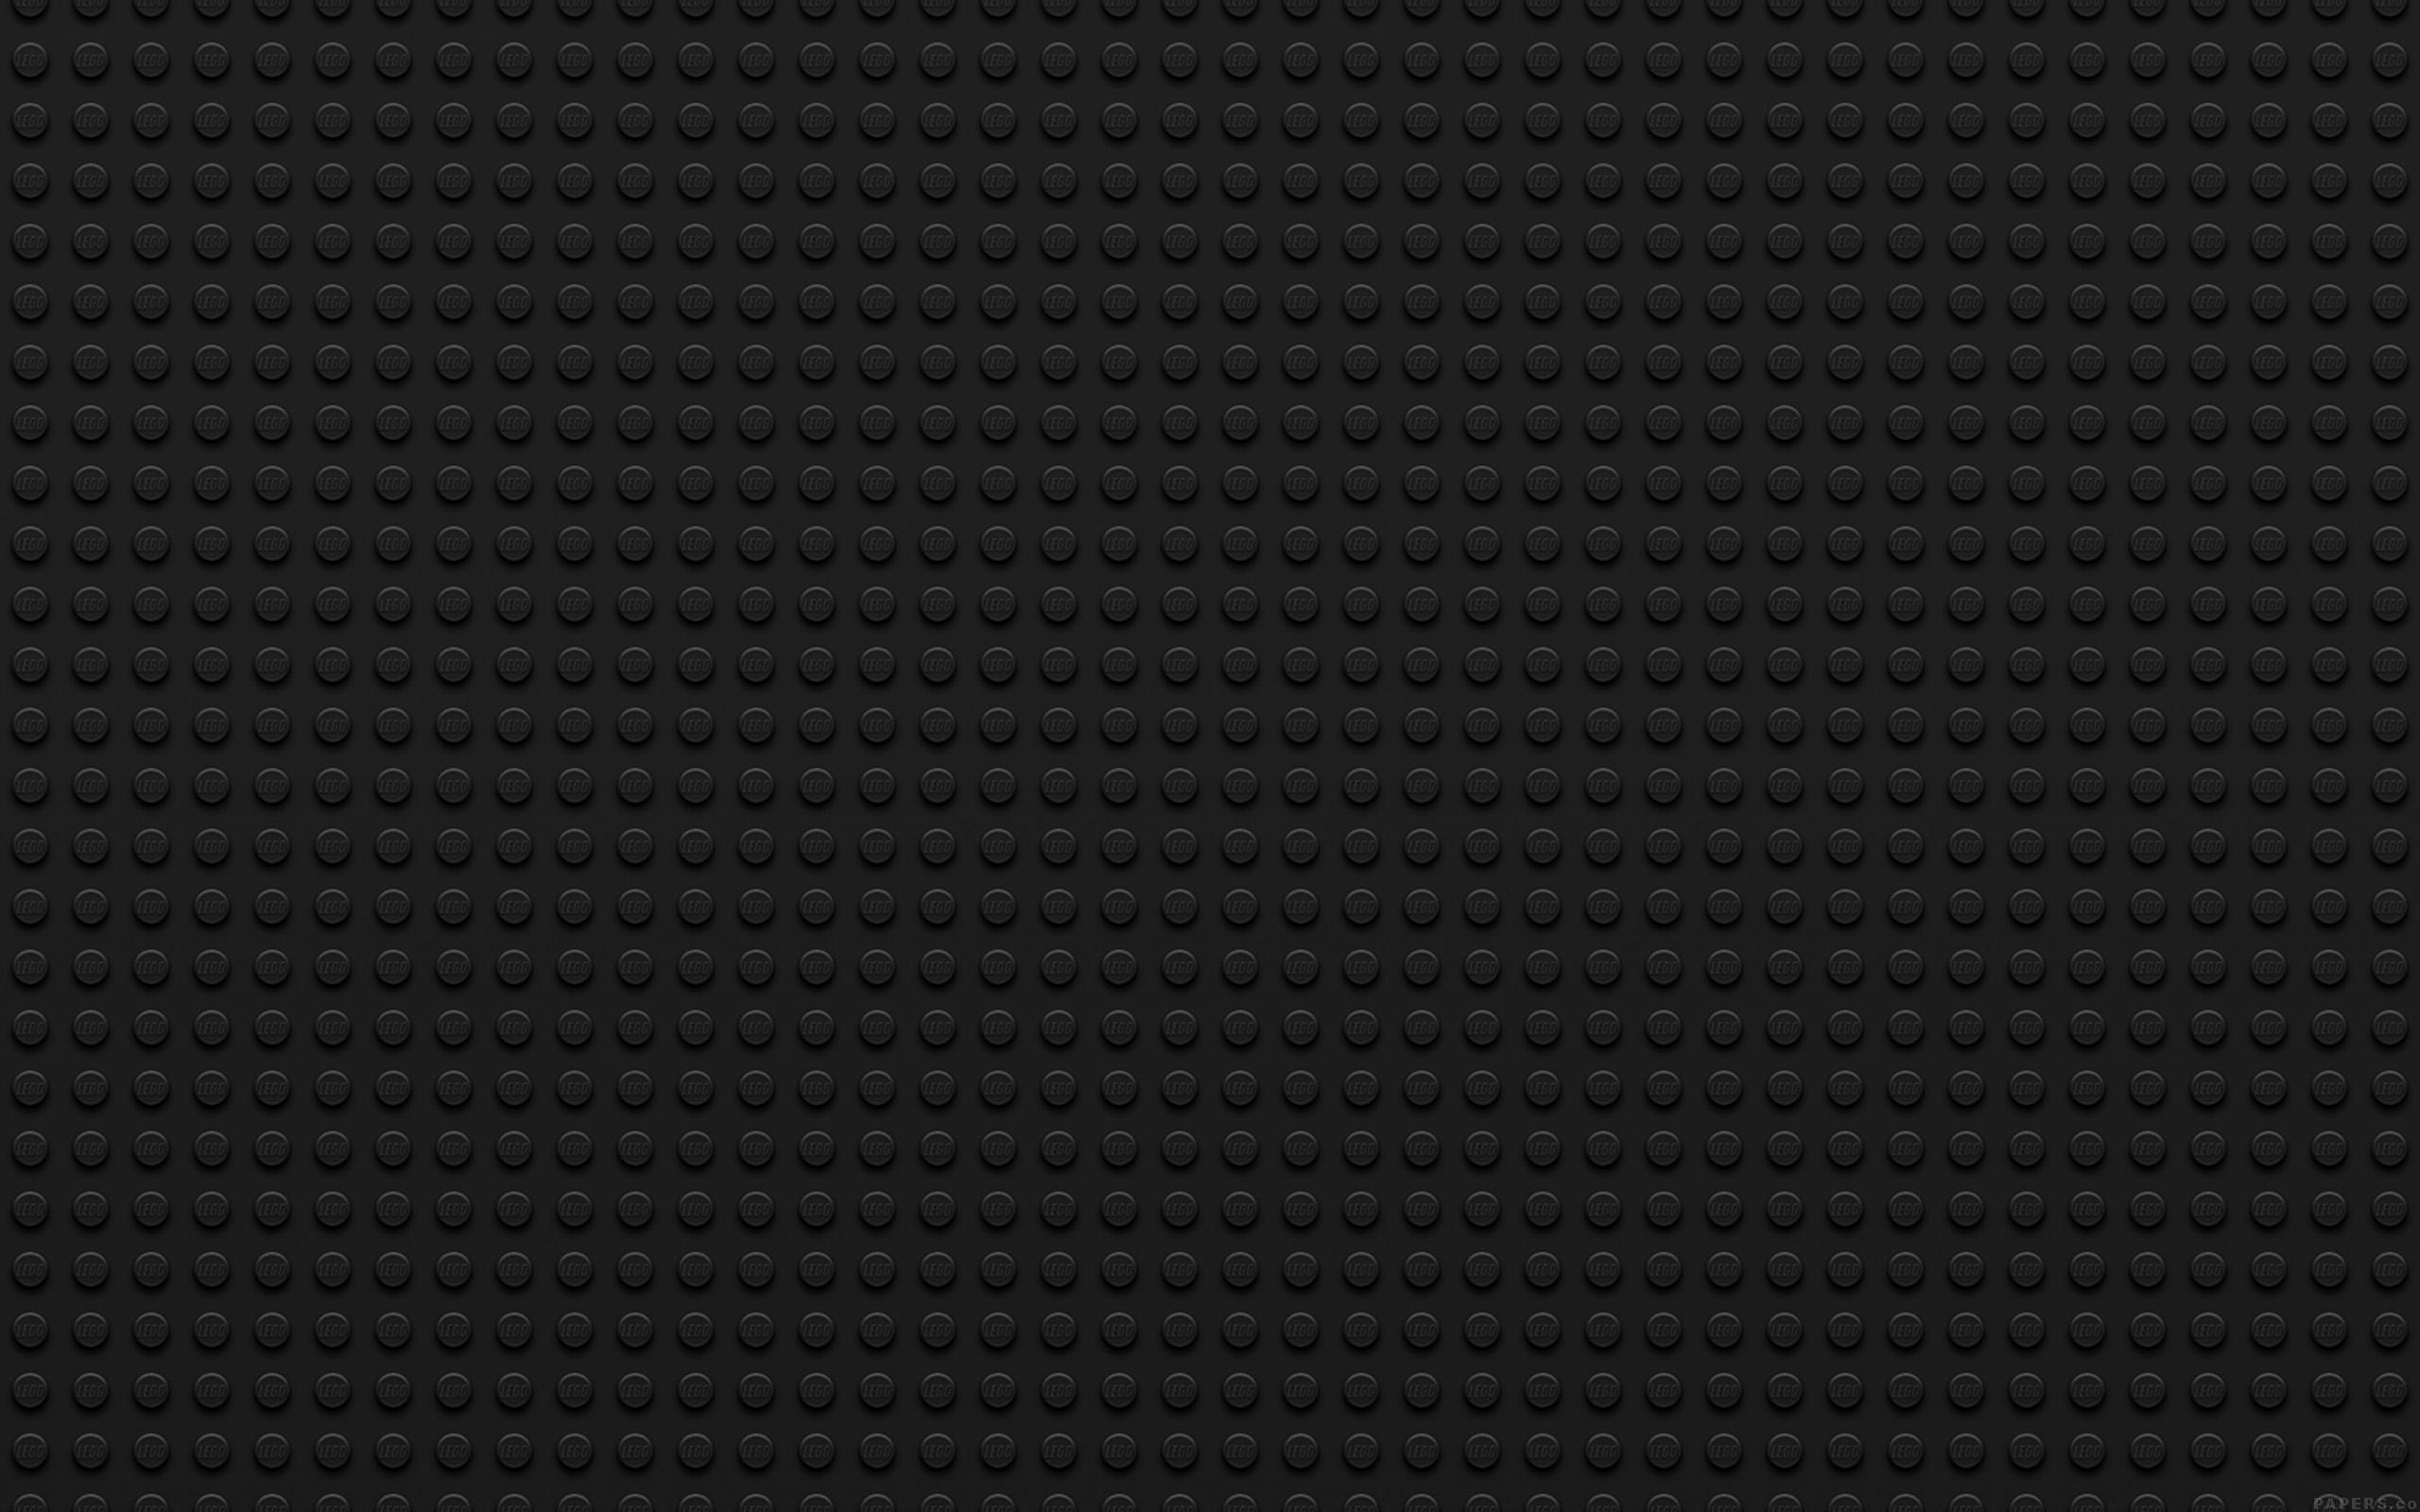 Blackberry Black Wallpaper Vf35 Lego Toy Dark Black Block Pattern Papers Co